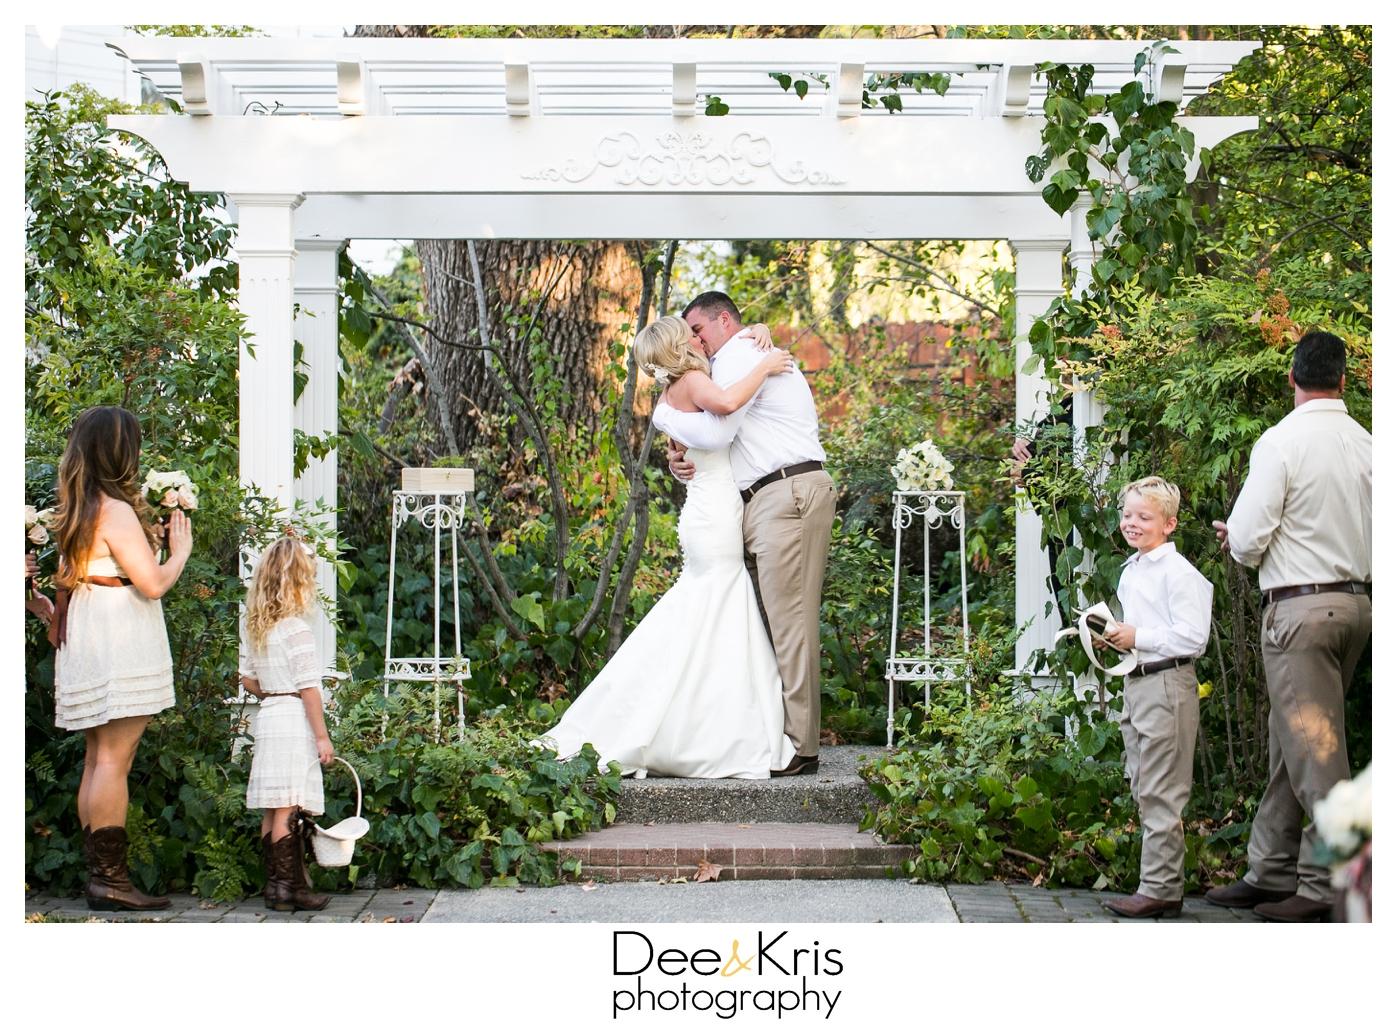 newscastle wedding gardens wedding dee and kris photography